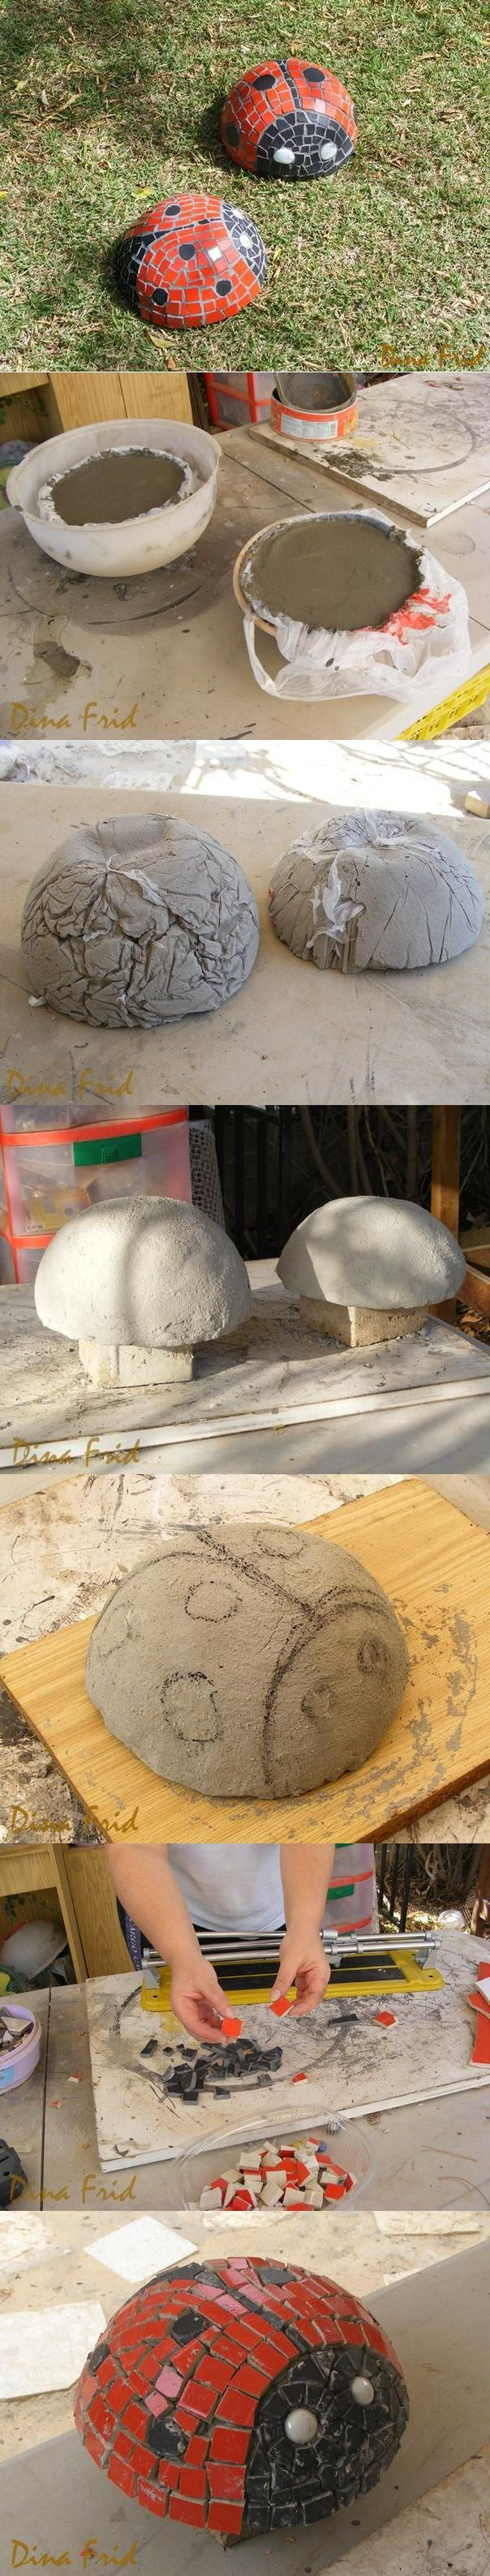 DIY Concrete Ladybug DIY Projects   UsefulDIY.com Follow Us on Facebook ==> http://www.facebook.com/UsefulDiy